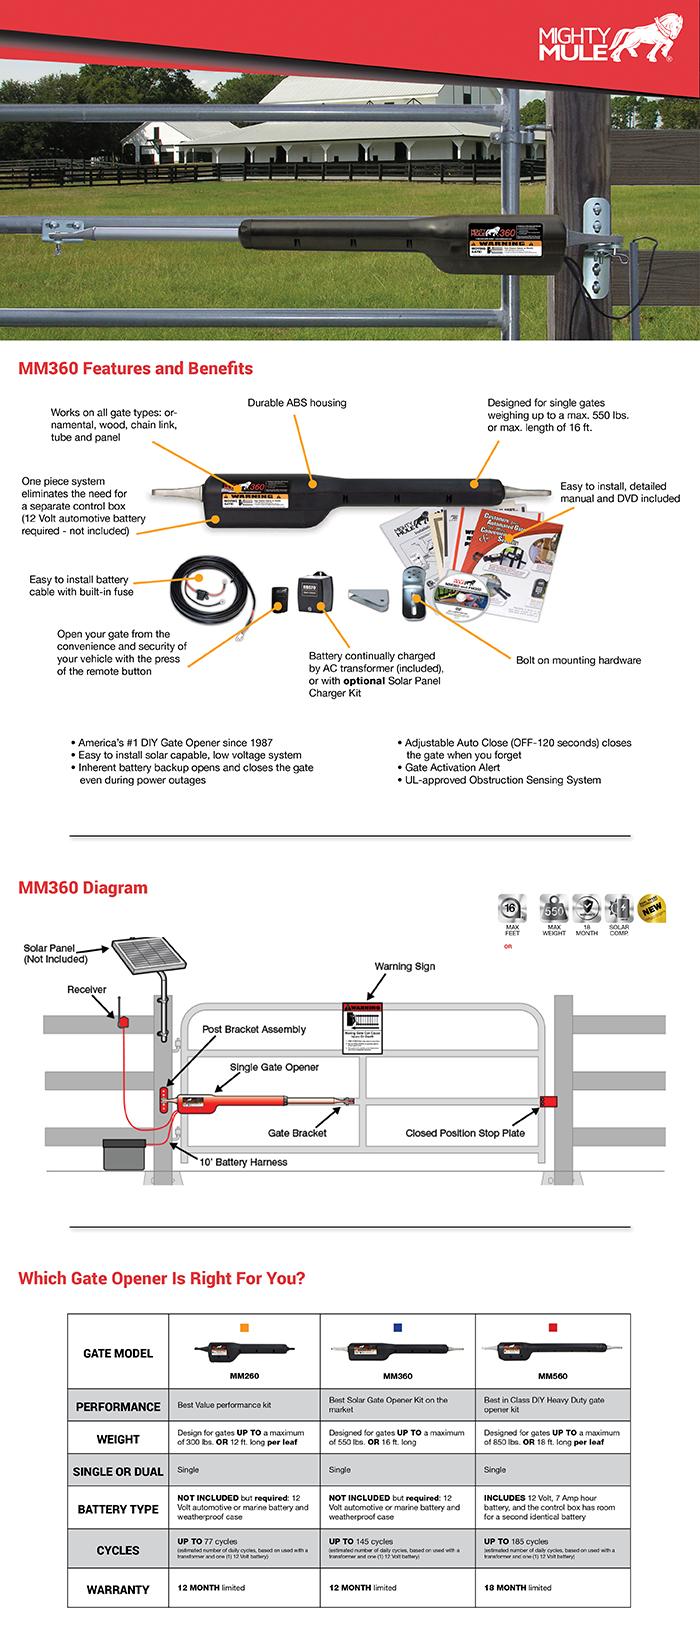 Mighty Mule Medium Duty Single Swing Automatic Gate Opener